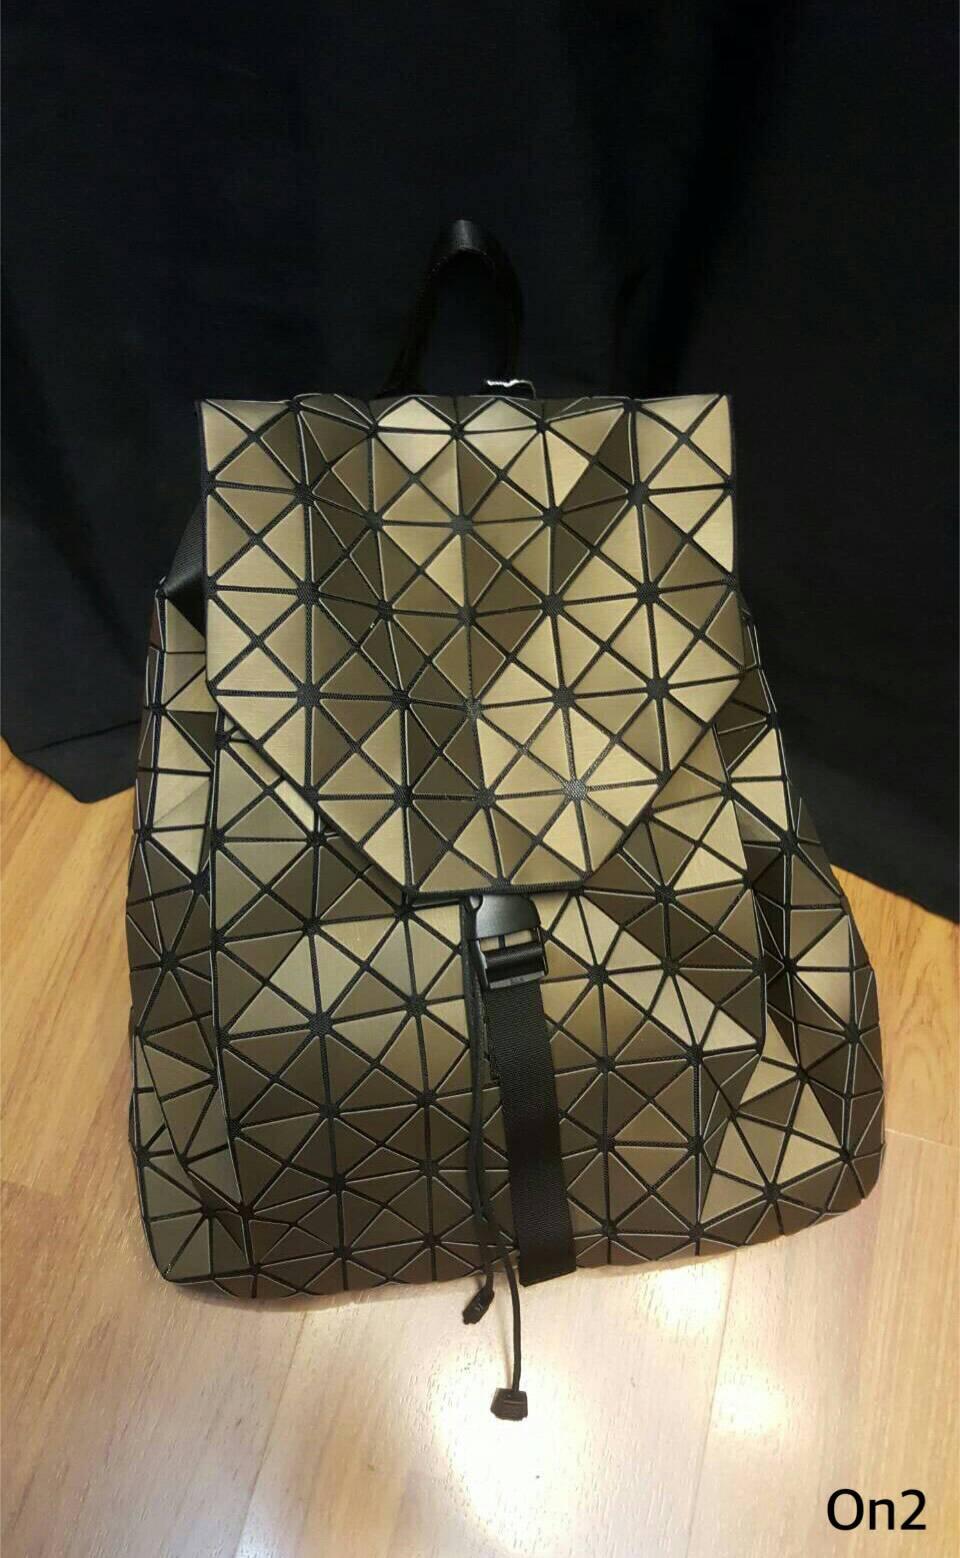 ISSEY MIYAKE BACKPACK กระเป๋าเป้ทรงขนมจีบใบใหญ่